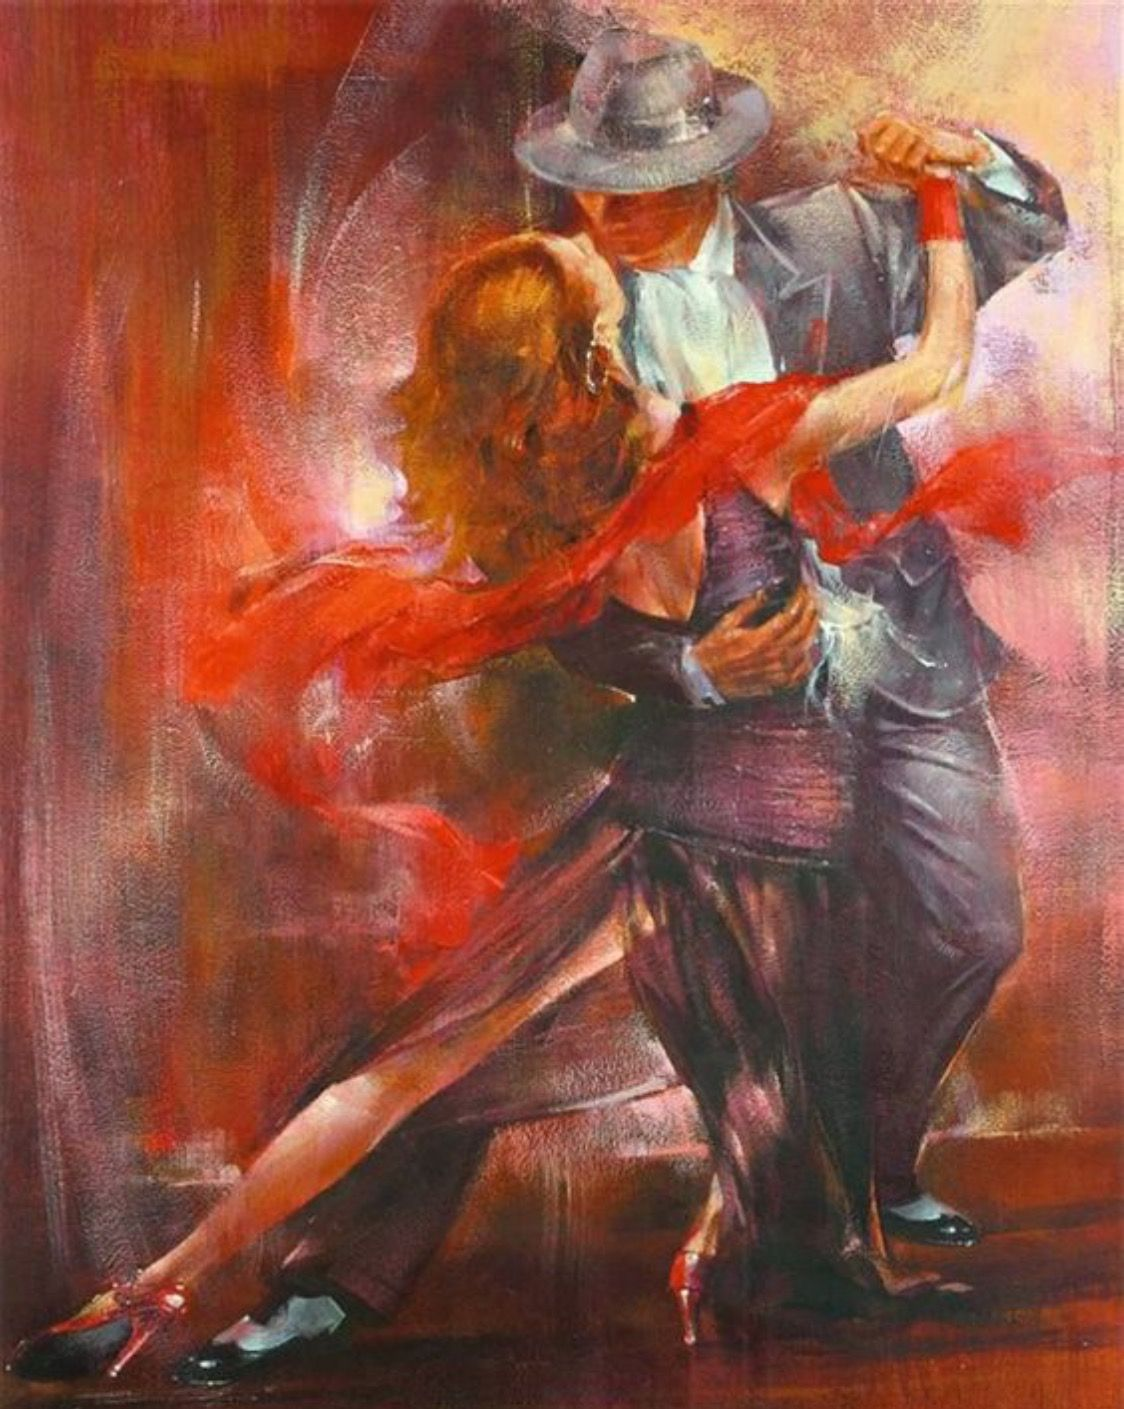 Porfavor un tango